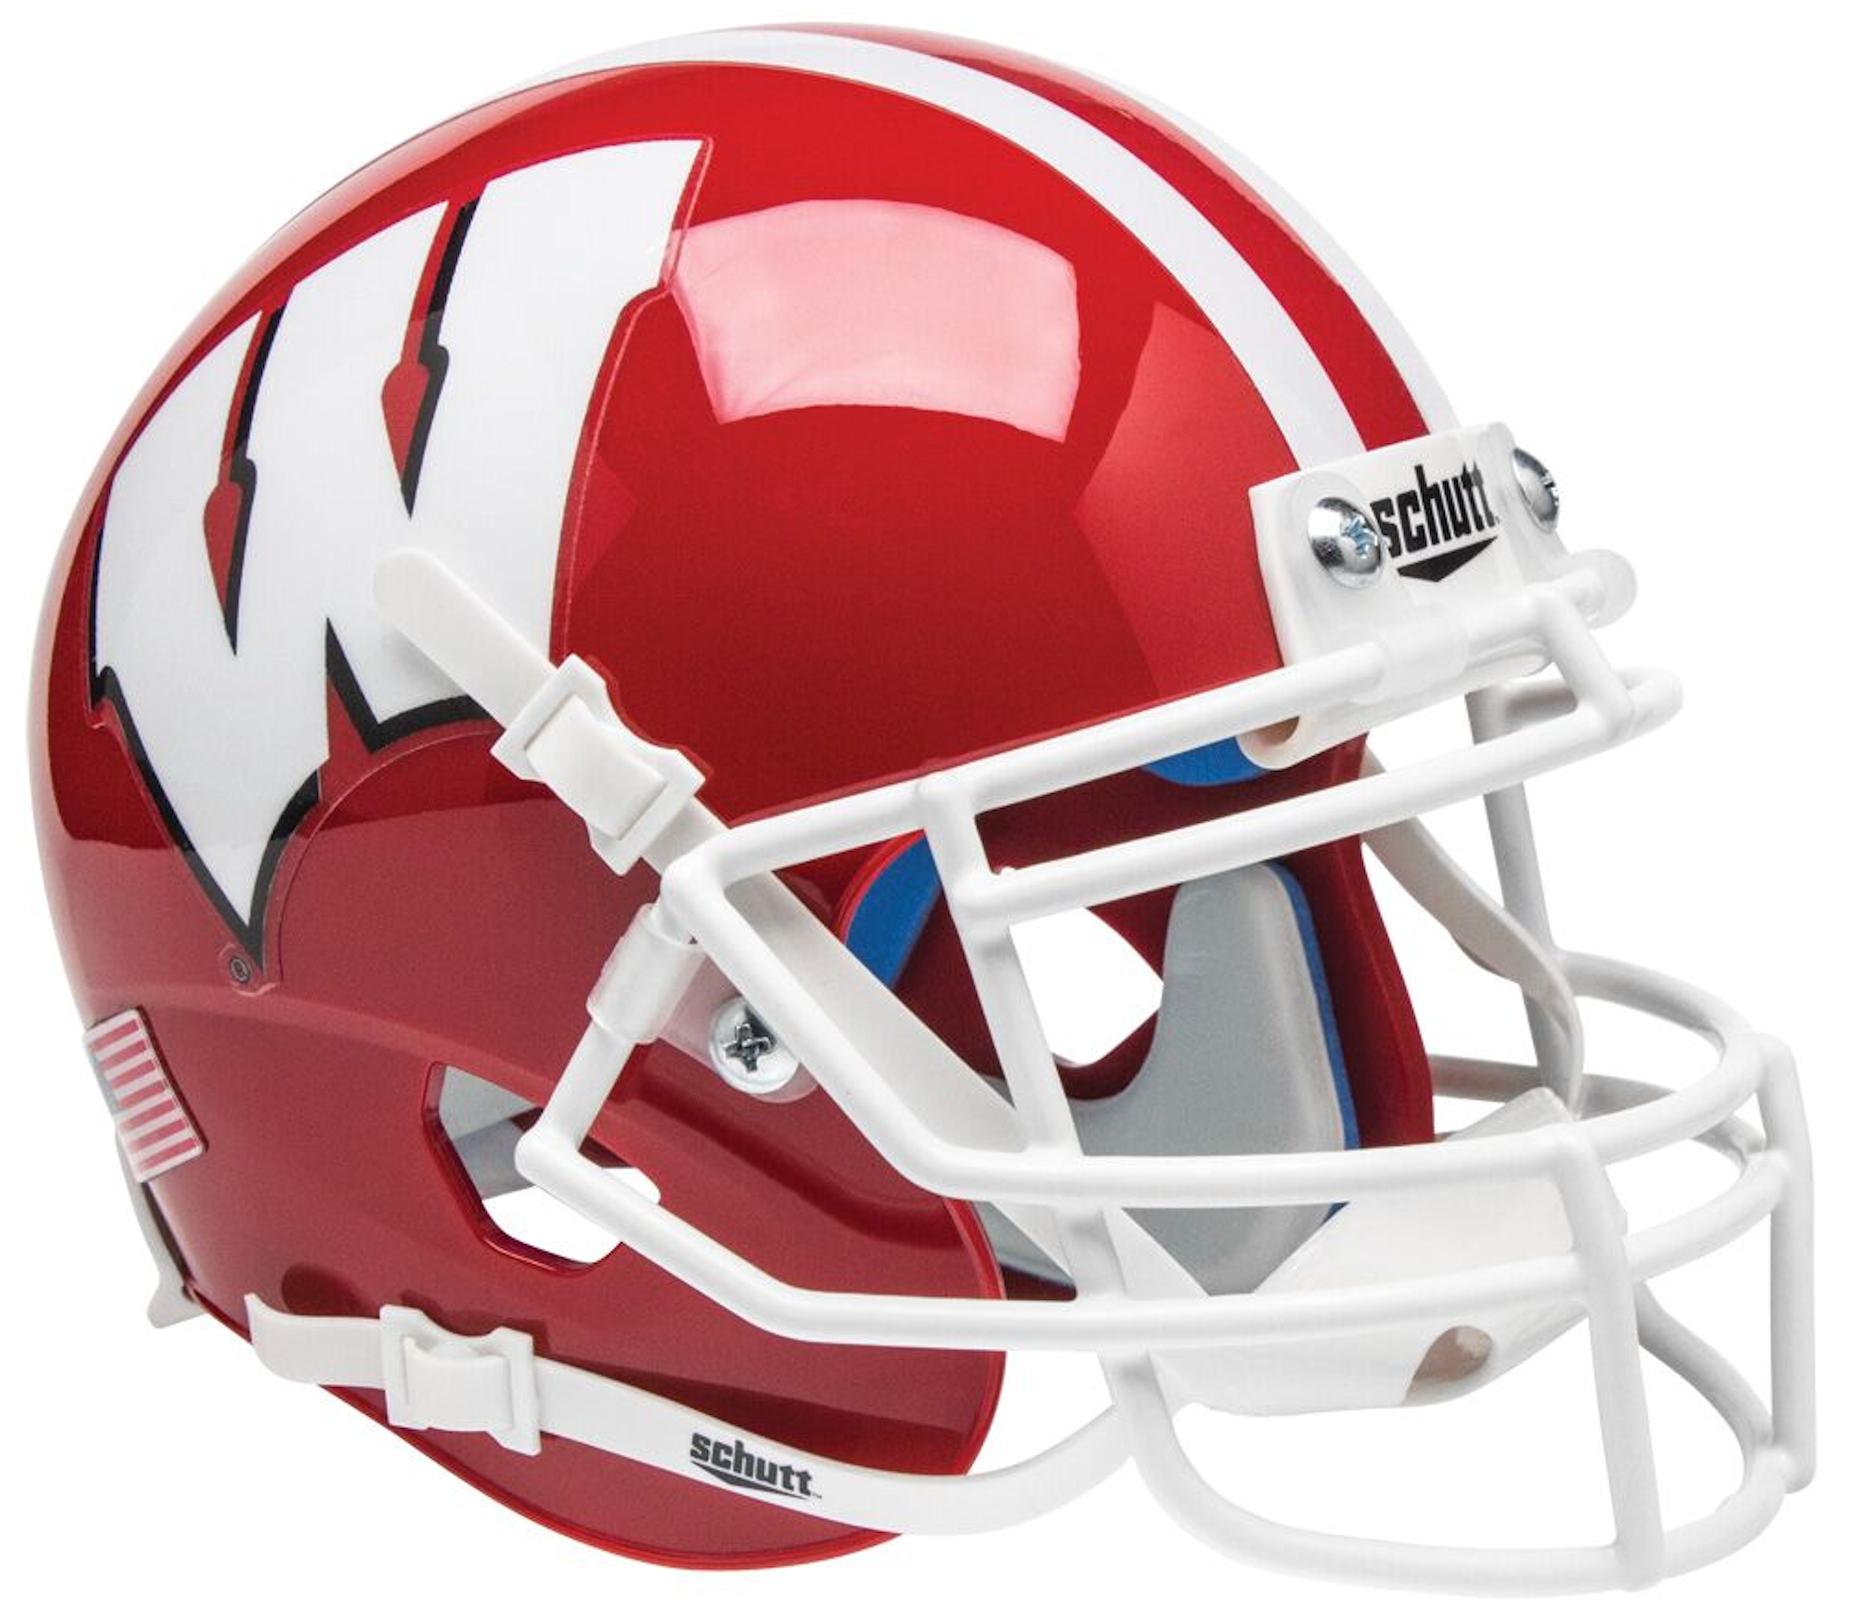 Wisconsin Badgers Mini XP Authentic Helmet Schutt <B>Scarlet</B>